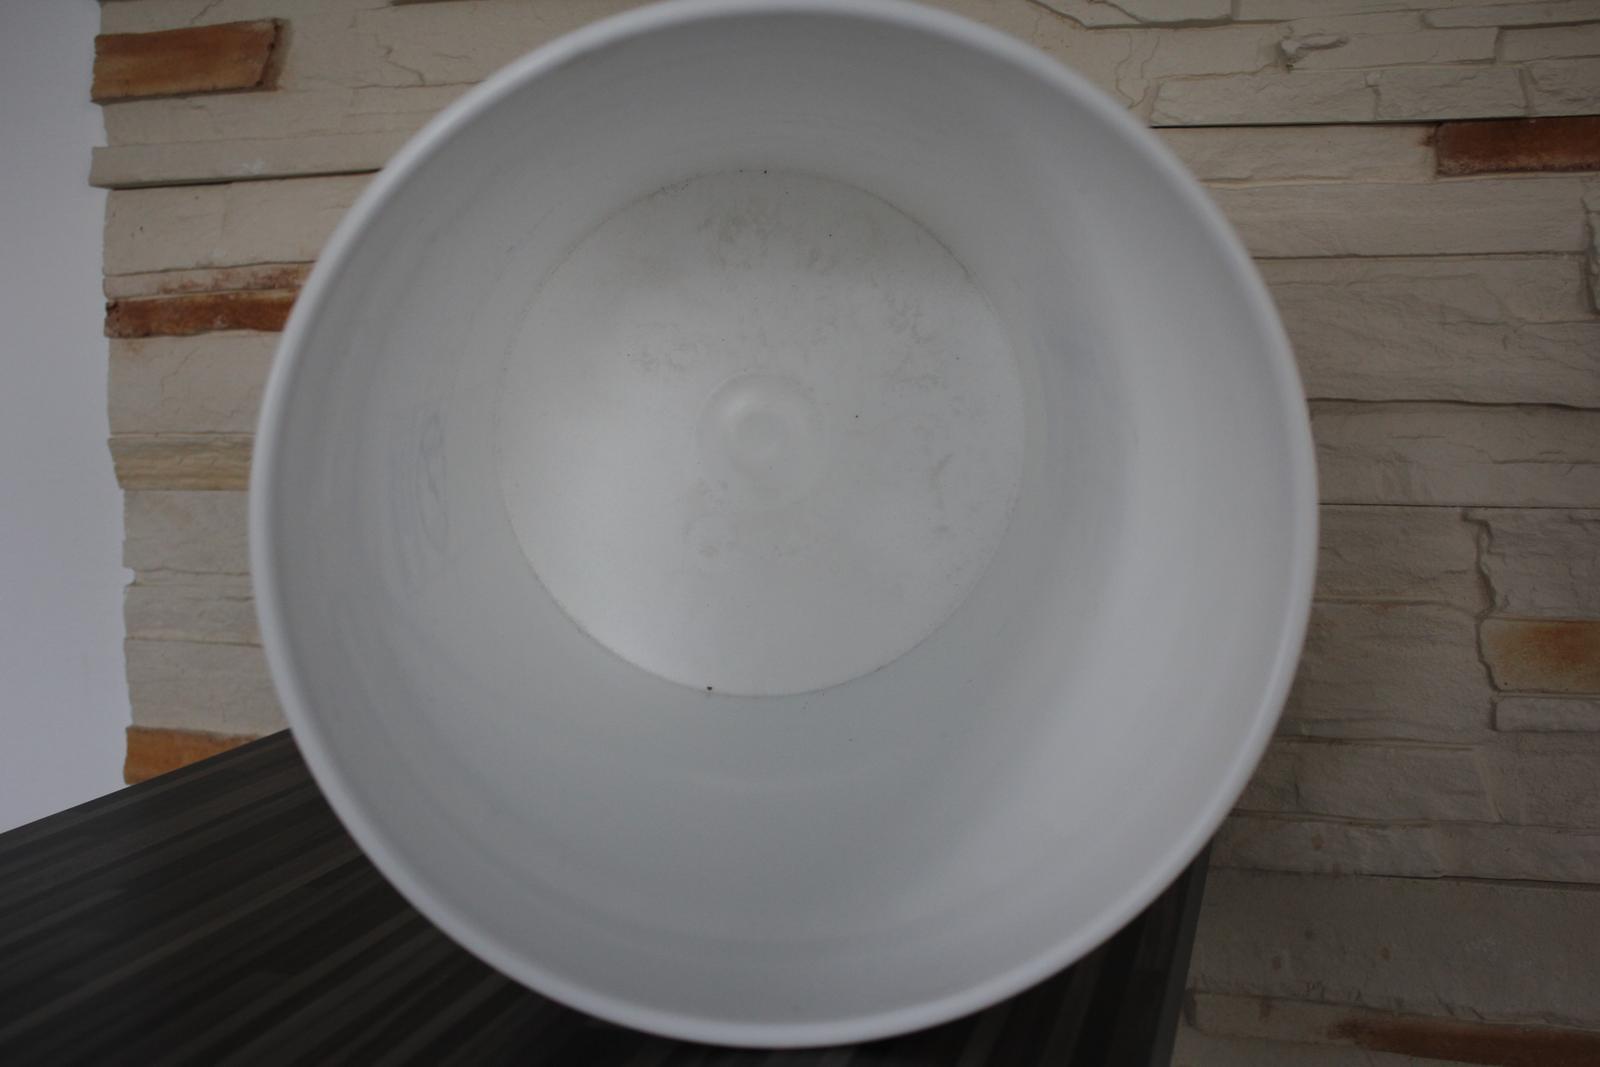 Extra pevné vedro - kýbel - Obrázok č. 2